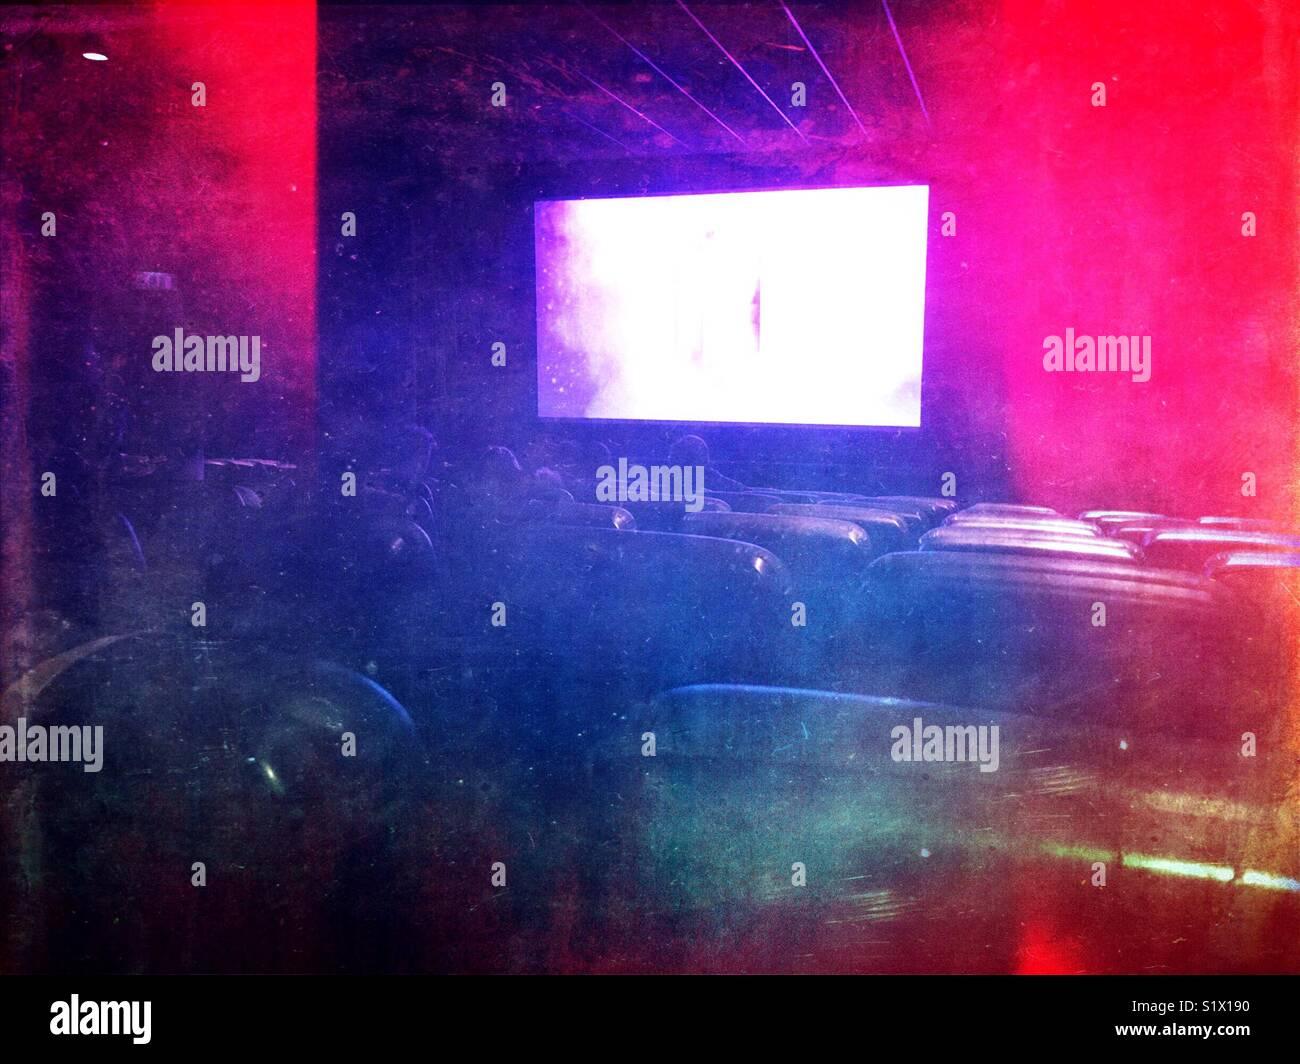 Cinema screen - Stock Image